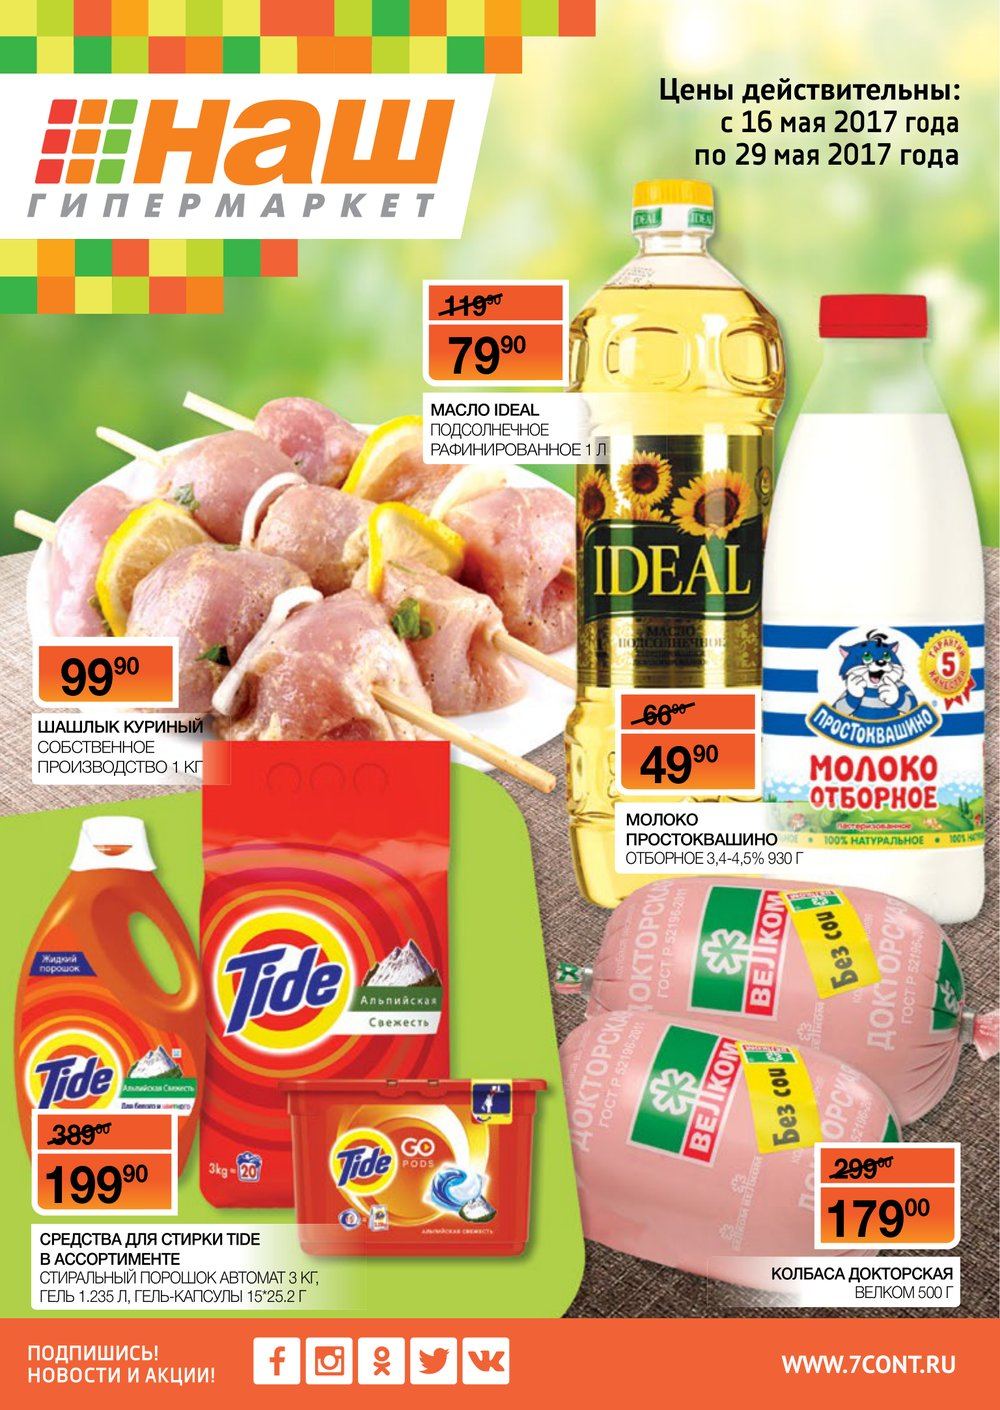 Каталог акций Наш Гипермаркет с 16 по 29 мая 2017 - стр. 1